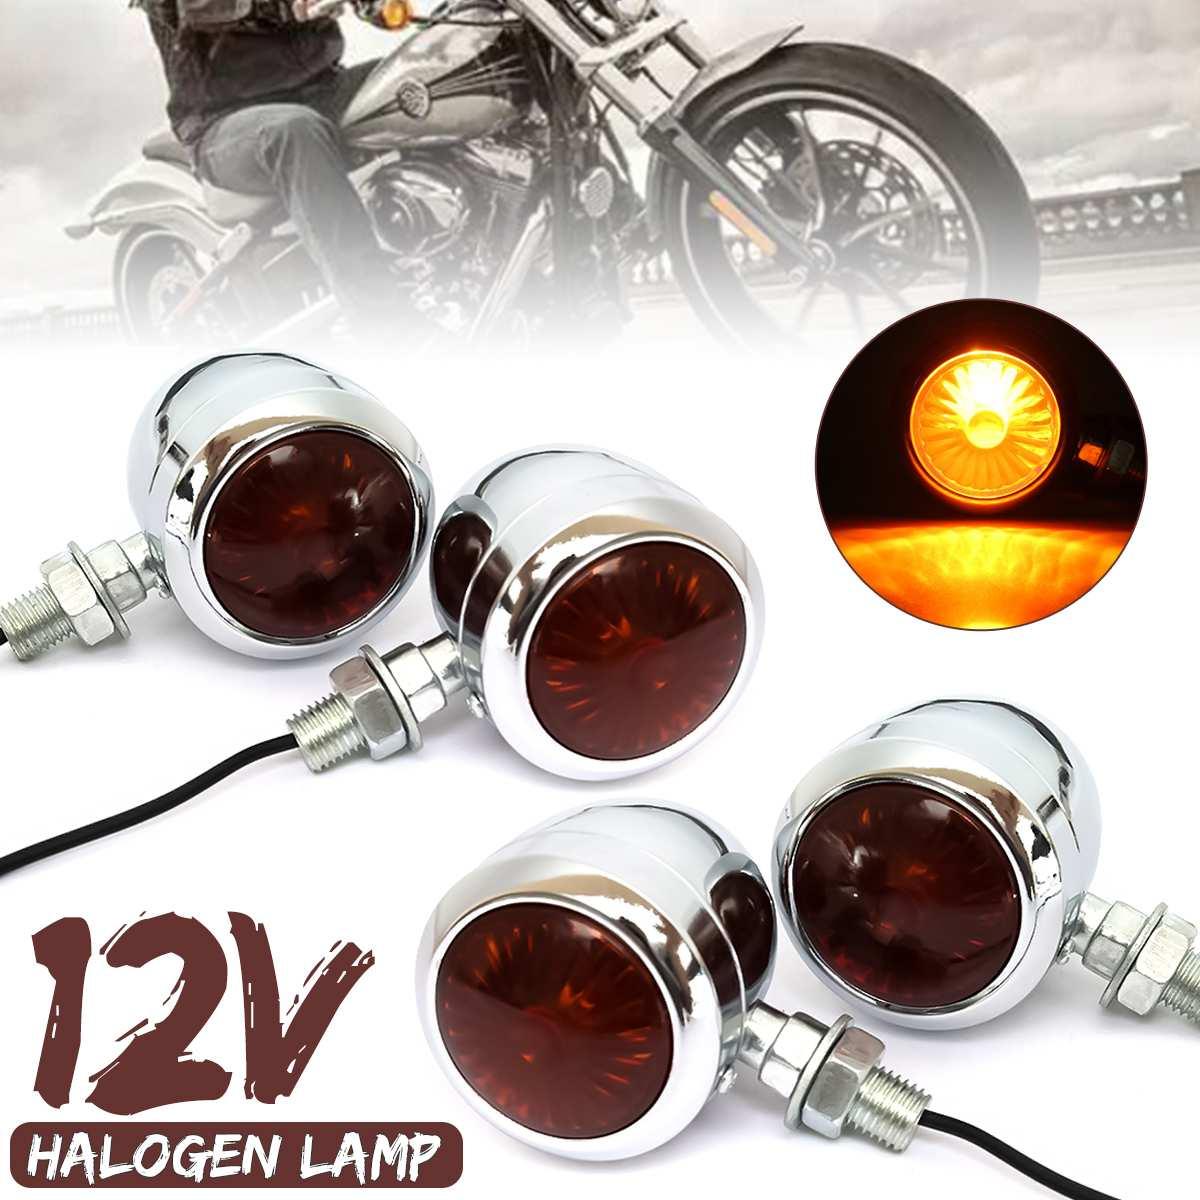 2 4Pcs 12V Retro Metal Chrome Motorcycle Turn Signal Indicator Halogen Light Bulb Lamp Vintage Amber Universal For Harley